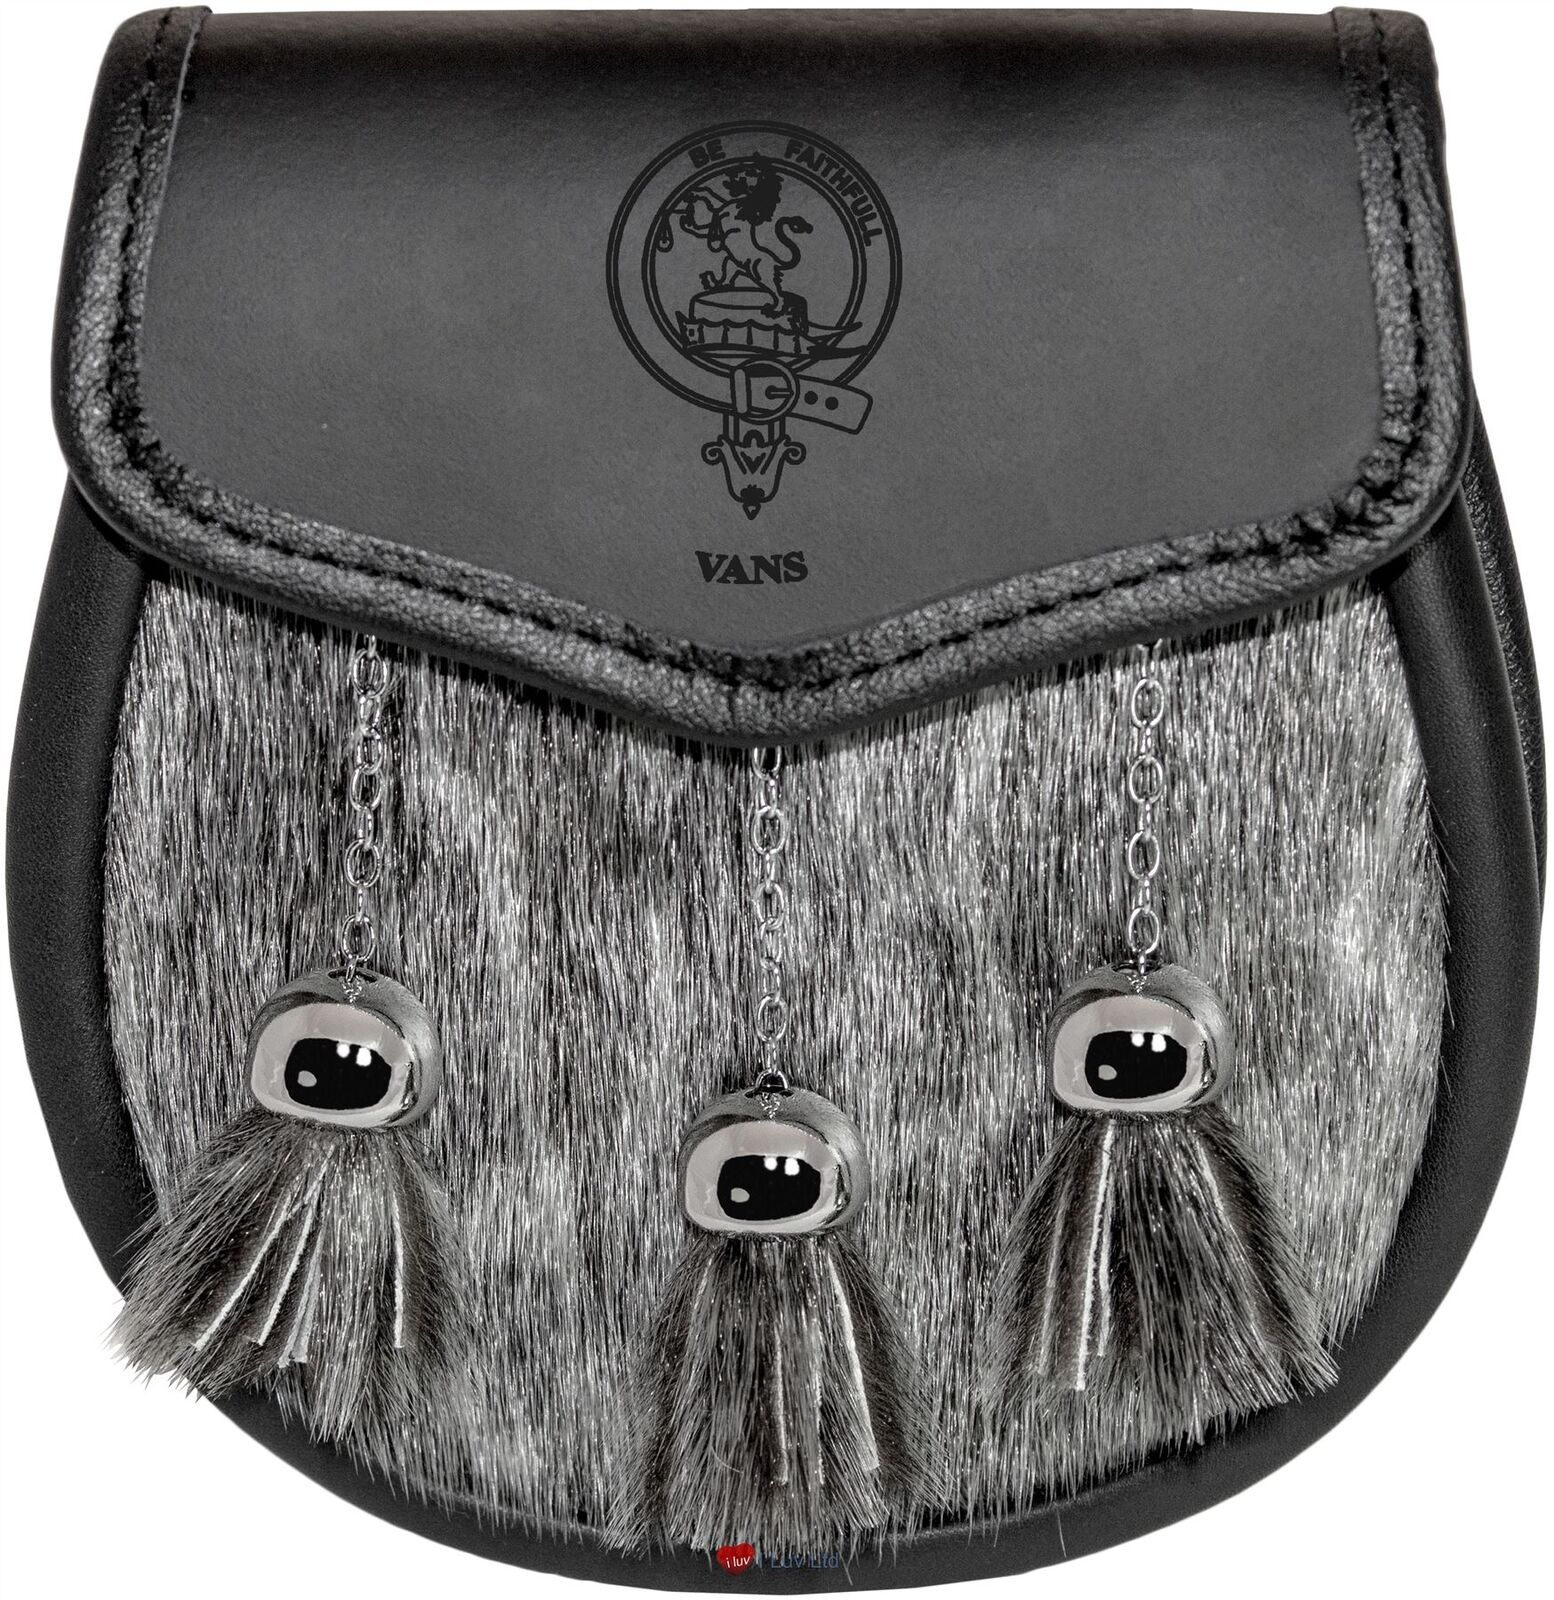 Vans Semi Dress Sporran Fur Plain Leather Flap Scottish Clan Crest